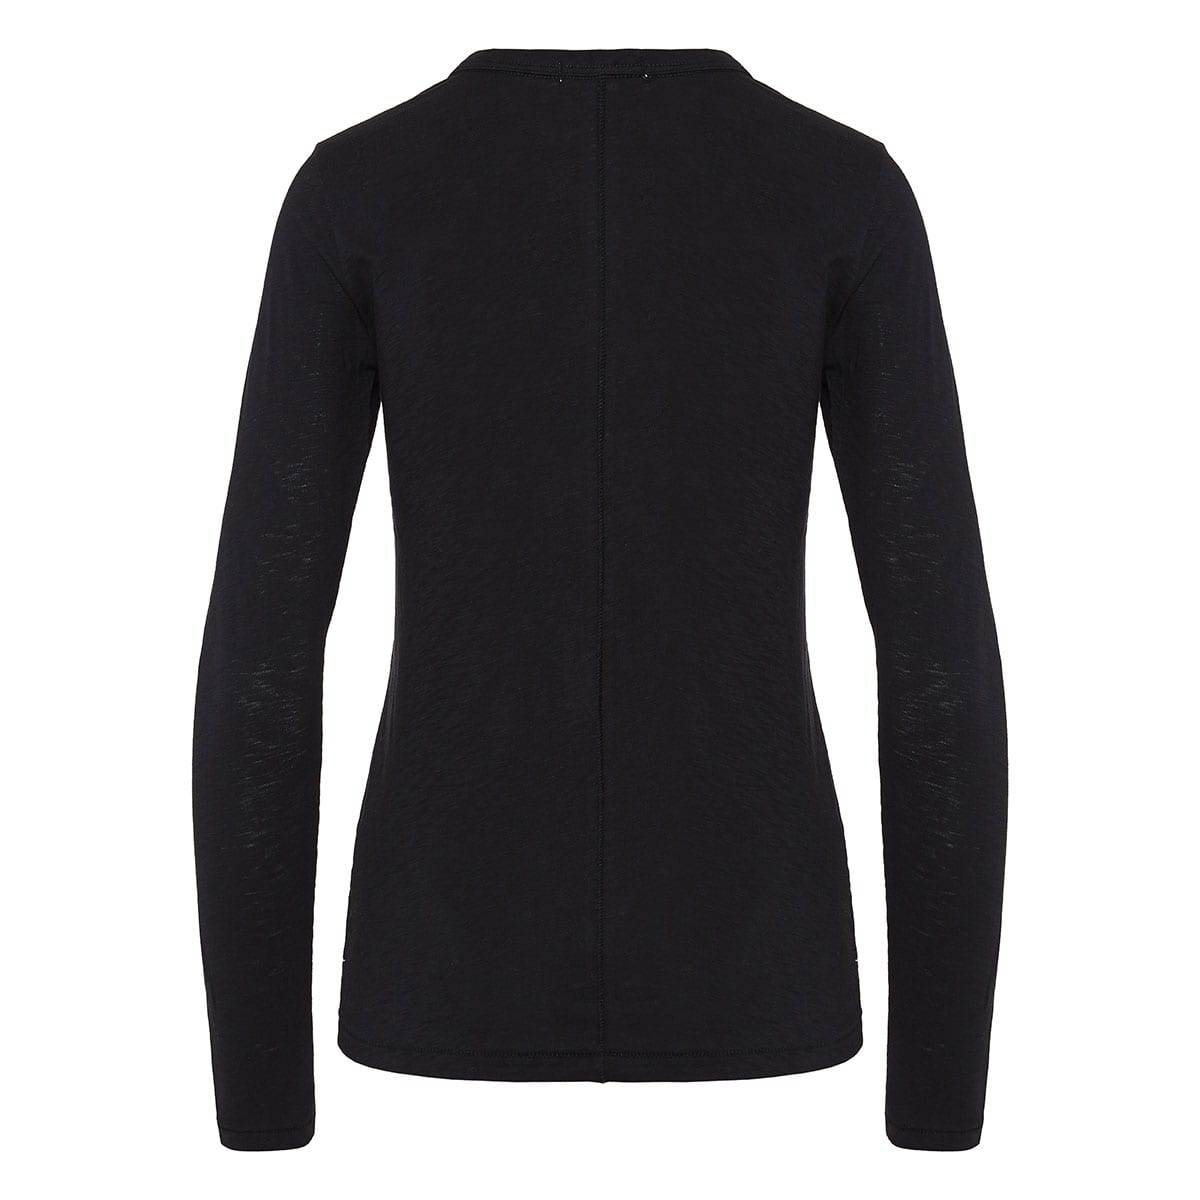 The Slub cotton blouse